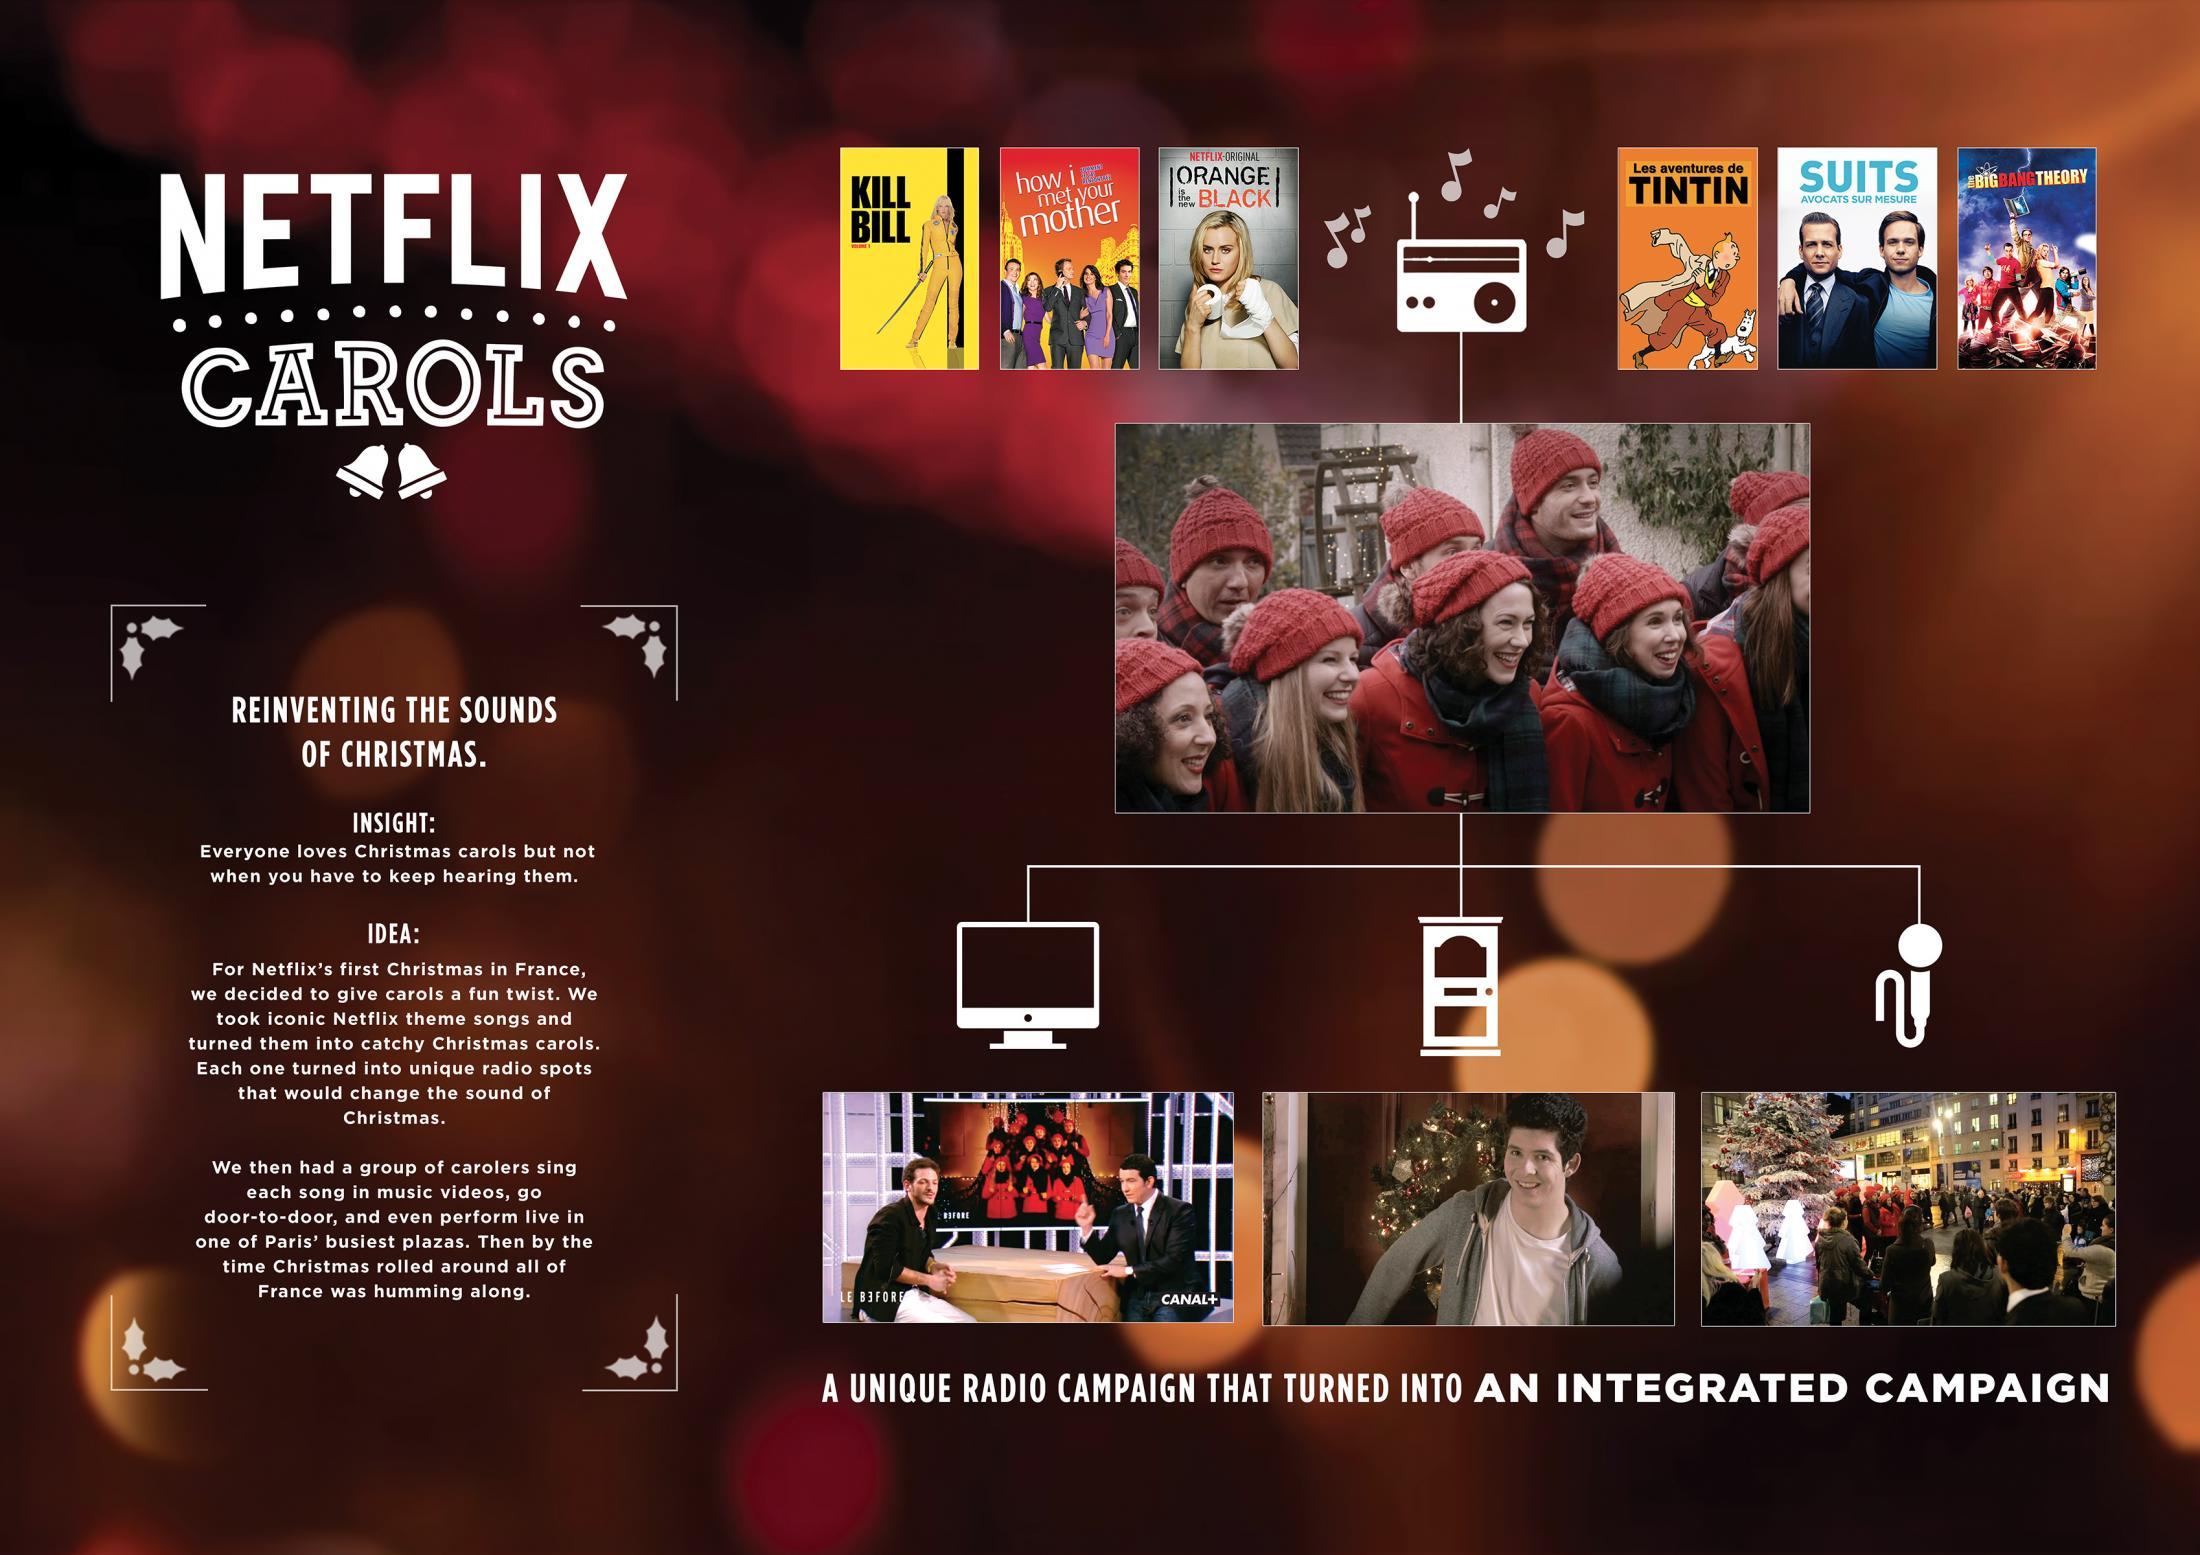 Thumbnail for NETFLIX CHRISTMAS CAROLS - SUITS